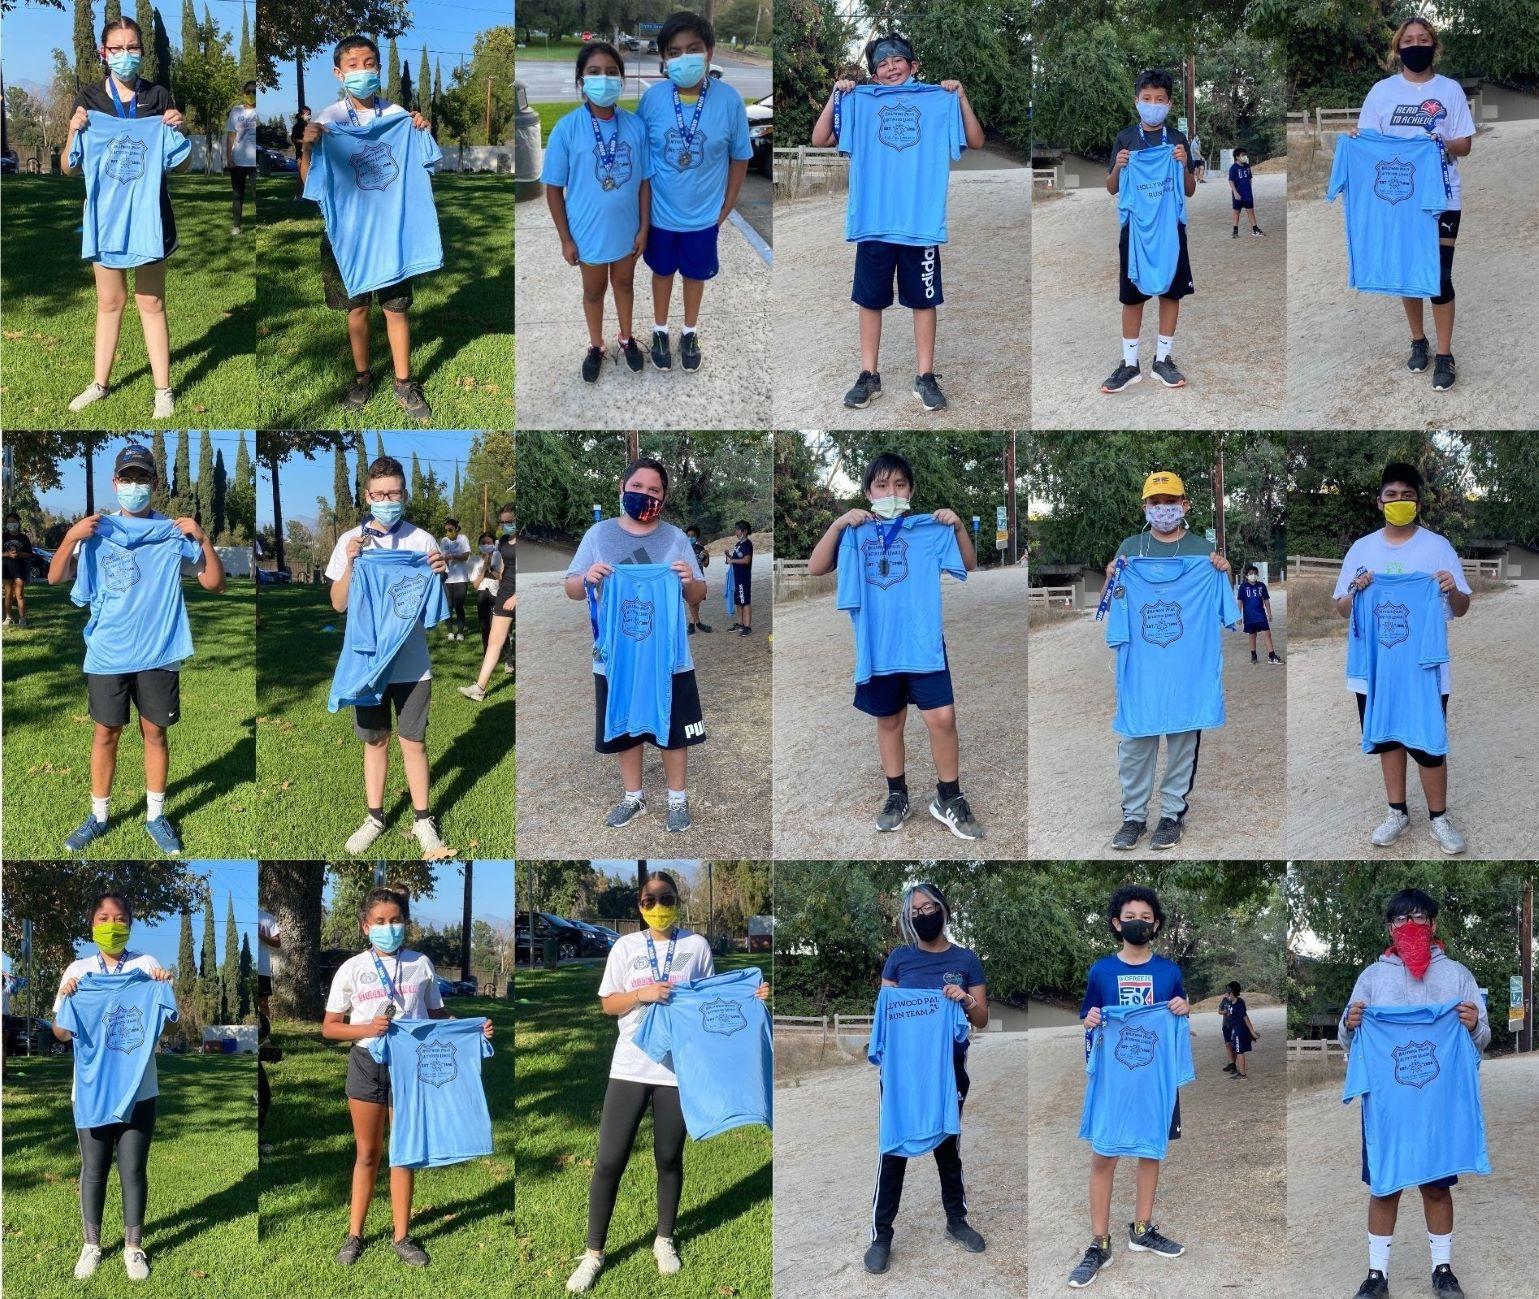 Hollywood PAL Run Club Finishes their First Virtual 5K